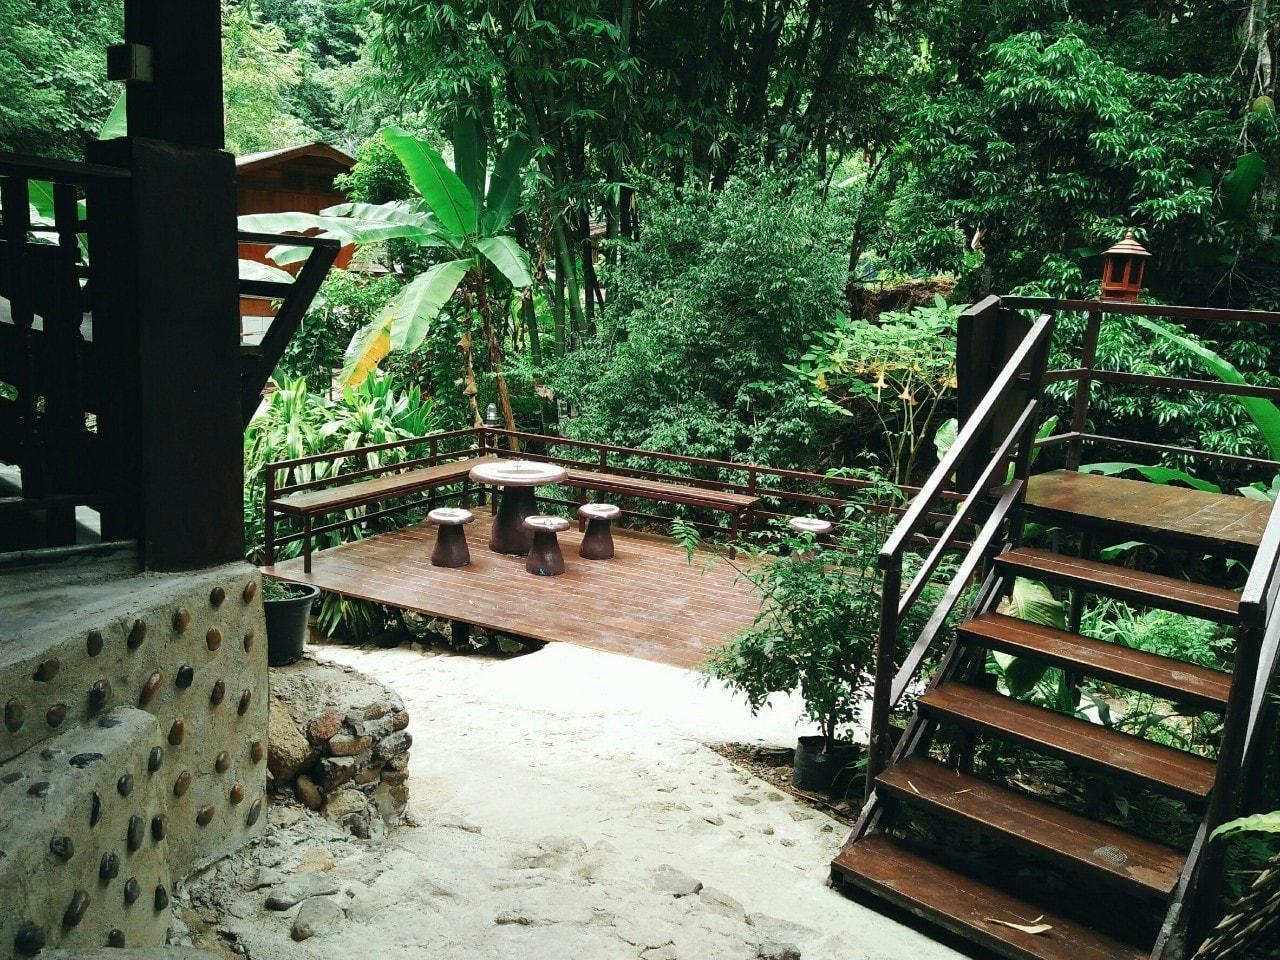 Huanhimnam Maekampong Streamside Standard 3 บังกะโล 1 ห้องนอน 1 ห้องน้ำส่วนตัว ขนาด 30 ตร.ม. – ดอยสะเก็ด